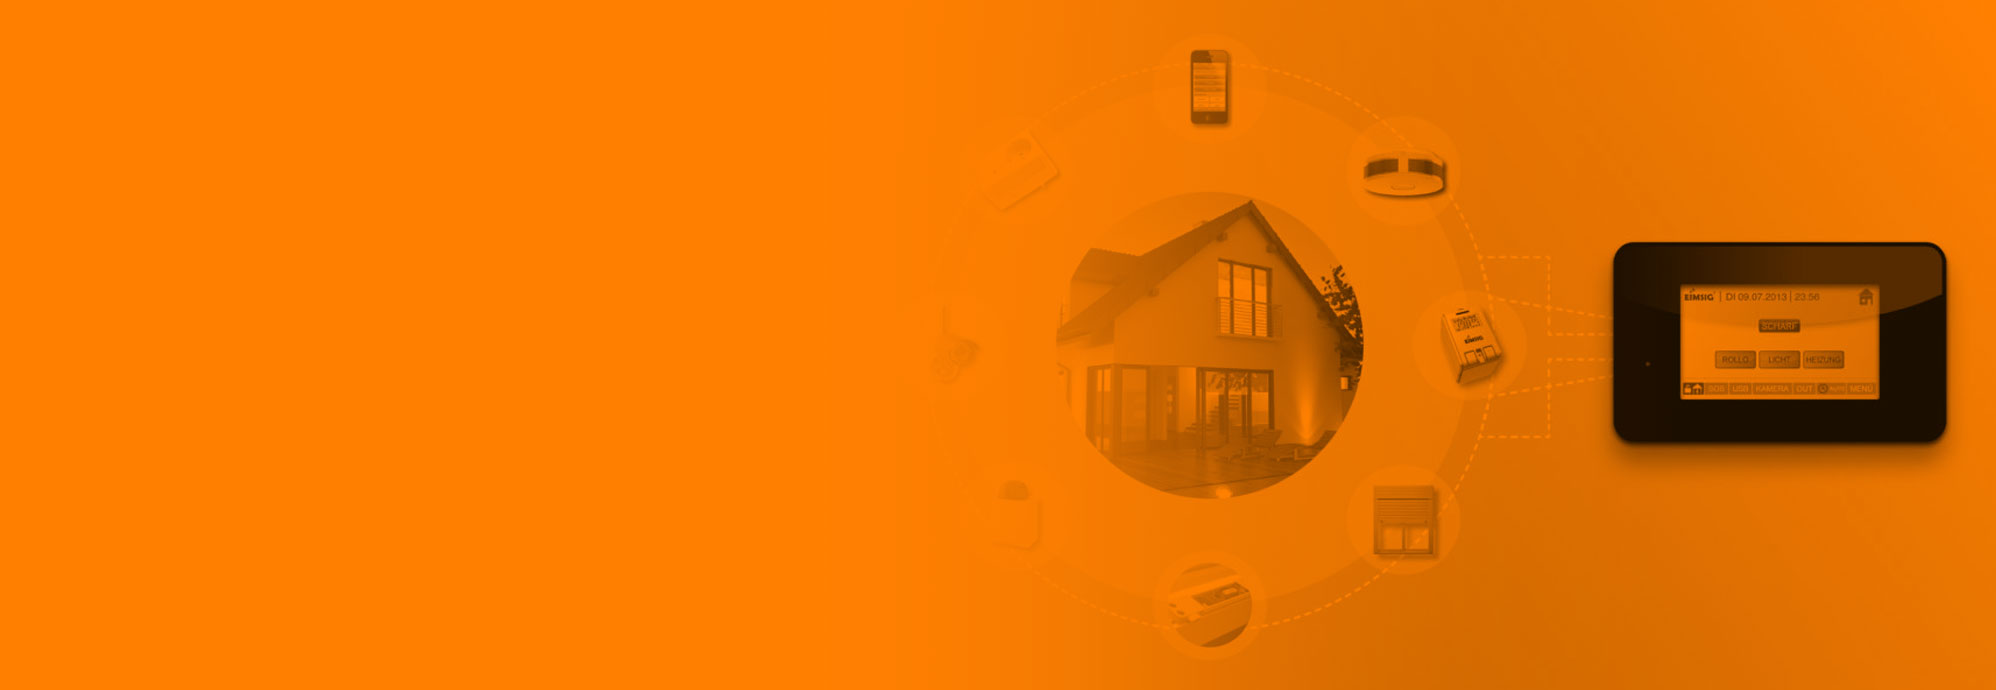 smart-home-alarm EiMSIG